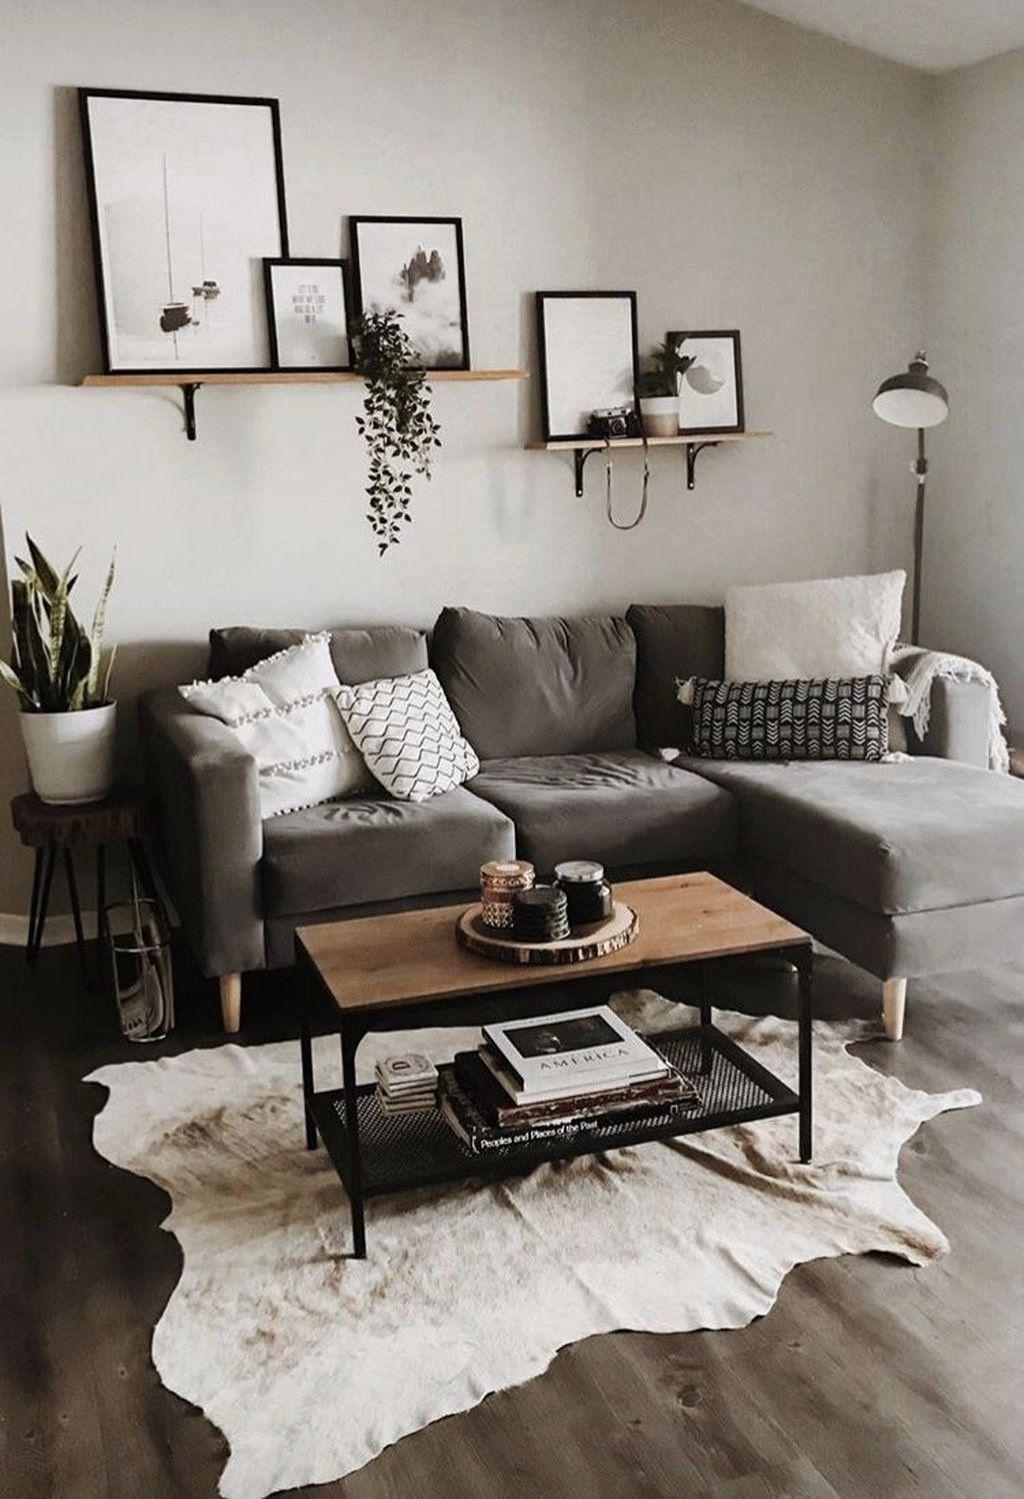 Simple Modern Living Room Luxury 42 Simple Living Room Apartment Decorating In 2020 Living Room Design Small Spaces Living Room Decor Modern Small Living Room Design